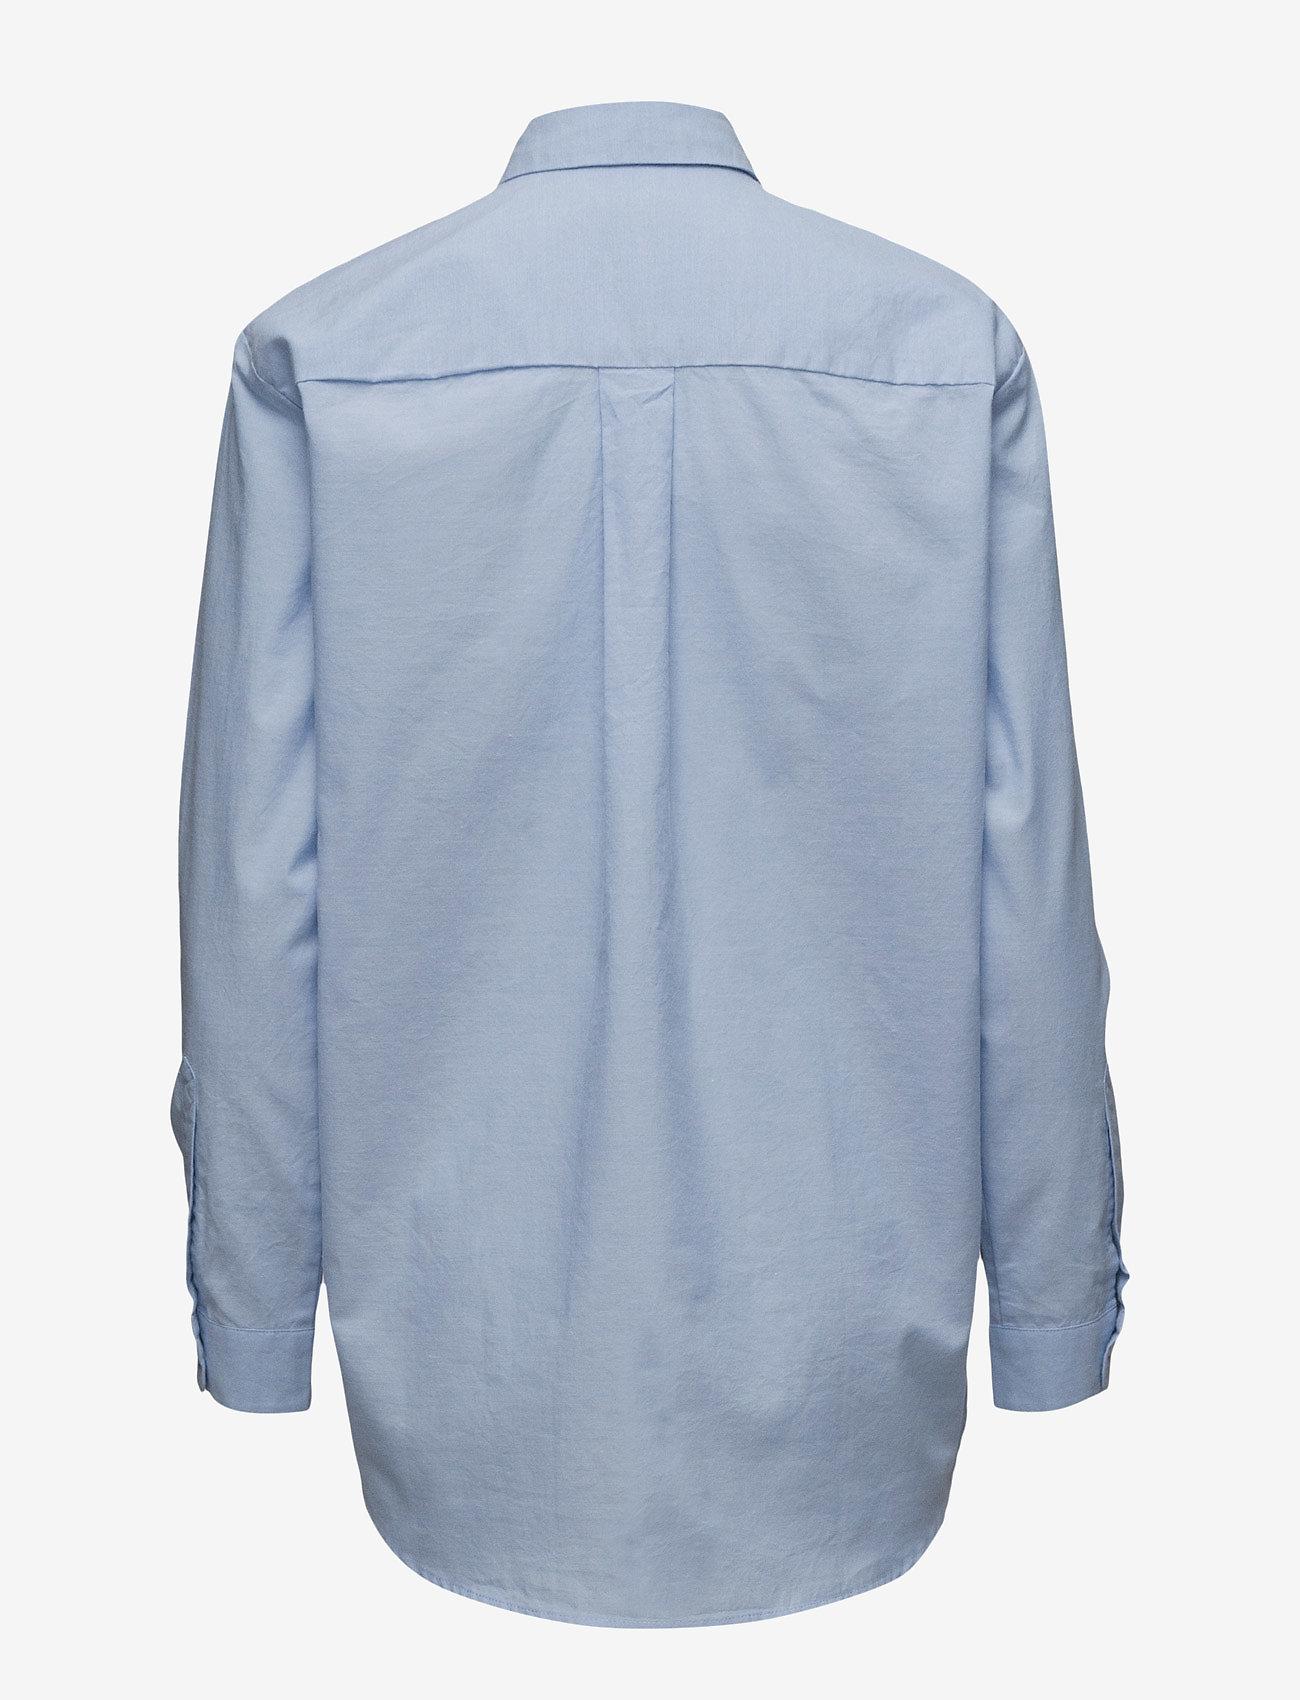 Samsøe Samsøe - Caico shirt 6135 - koszule z długimi rękawami - 6135 oxford blue - 1